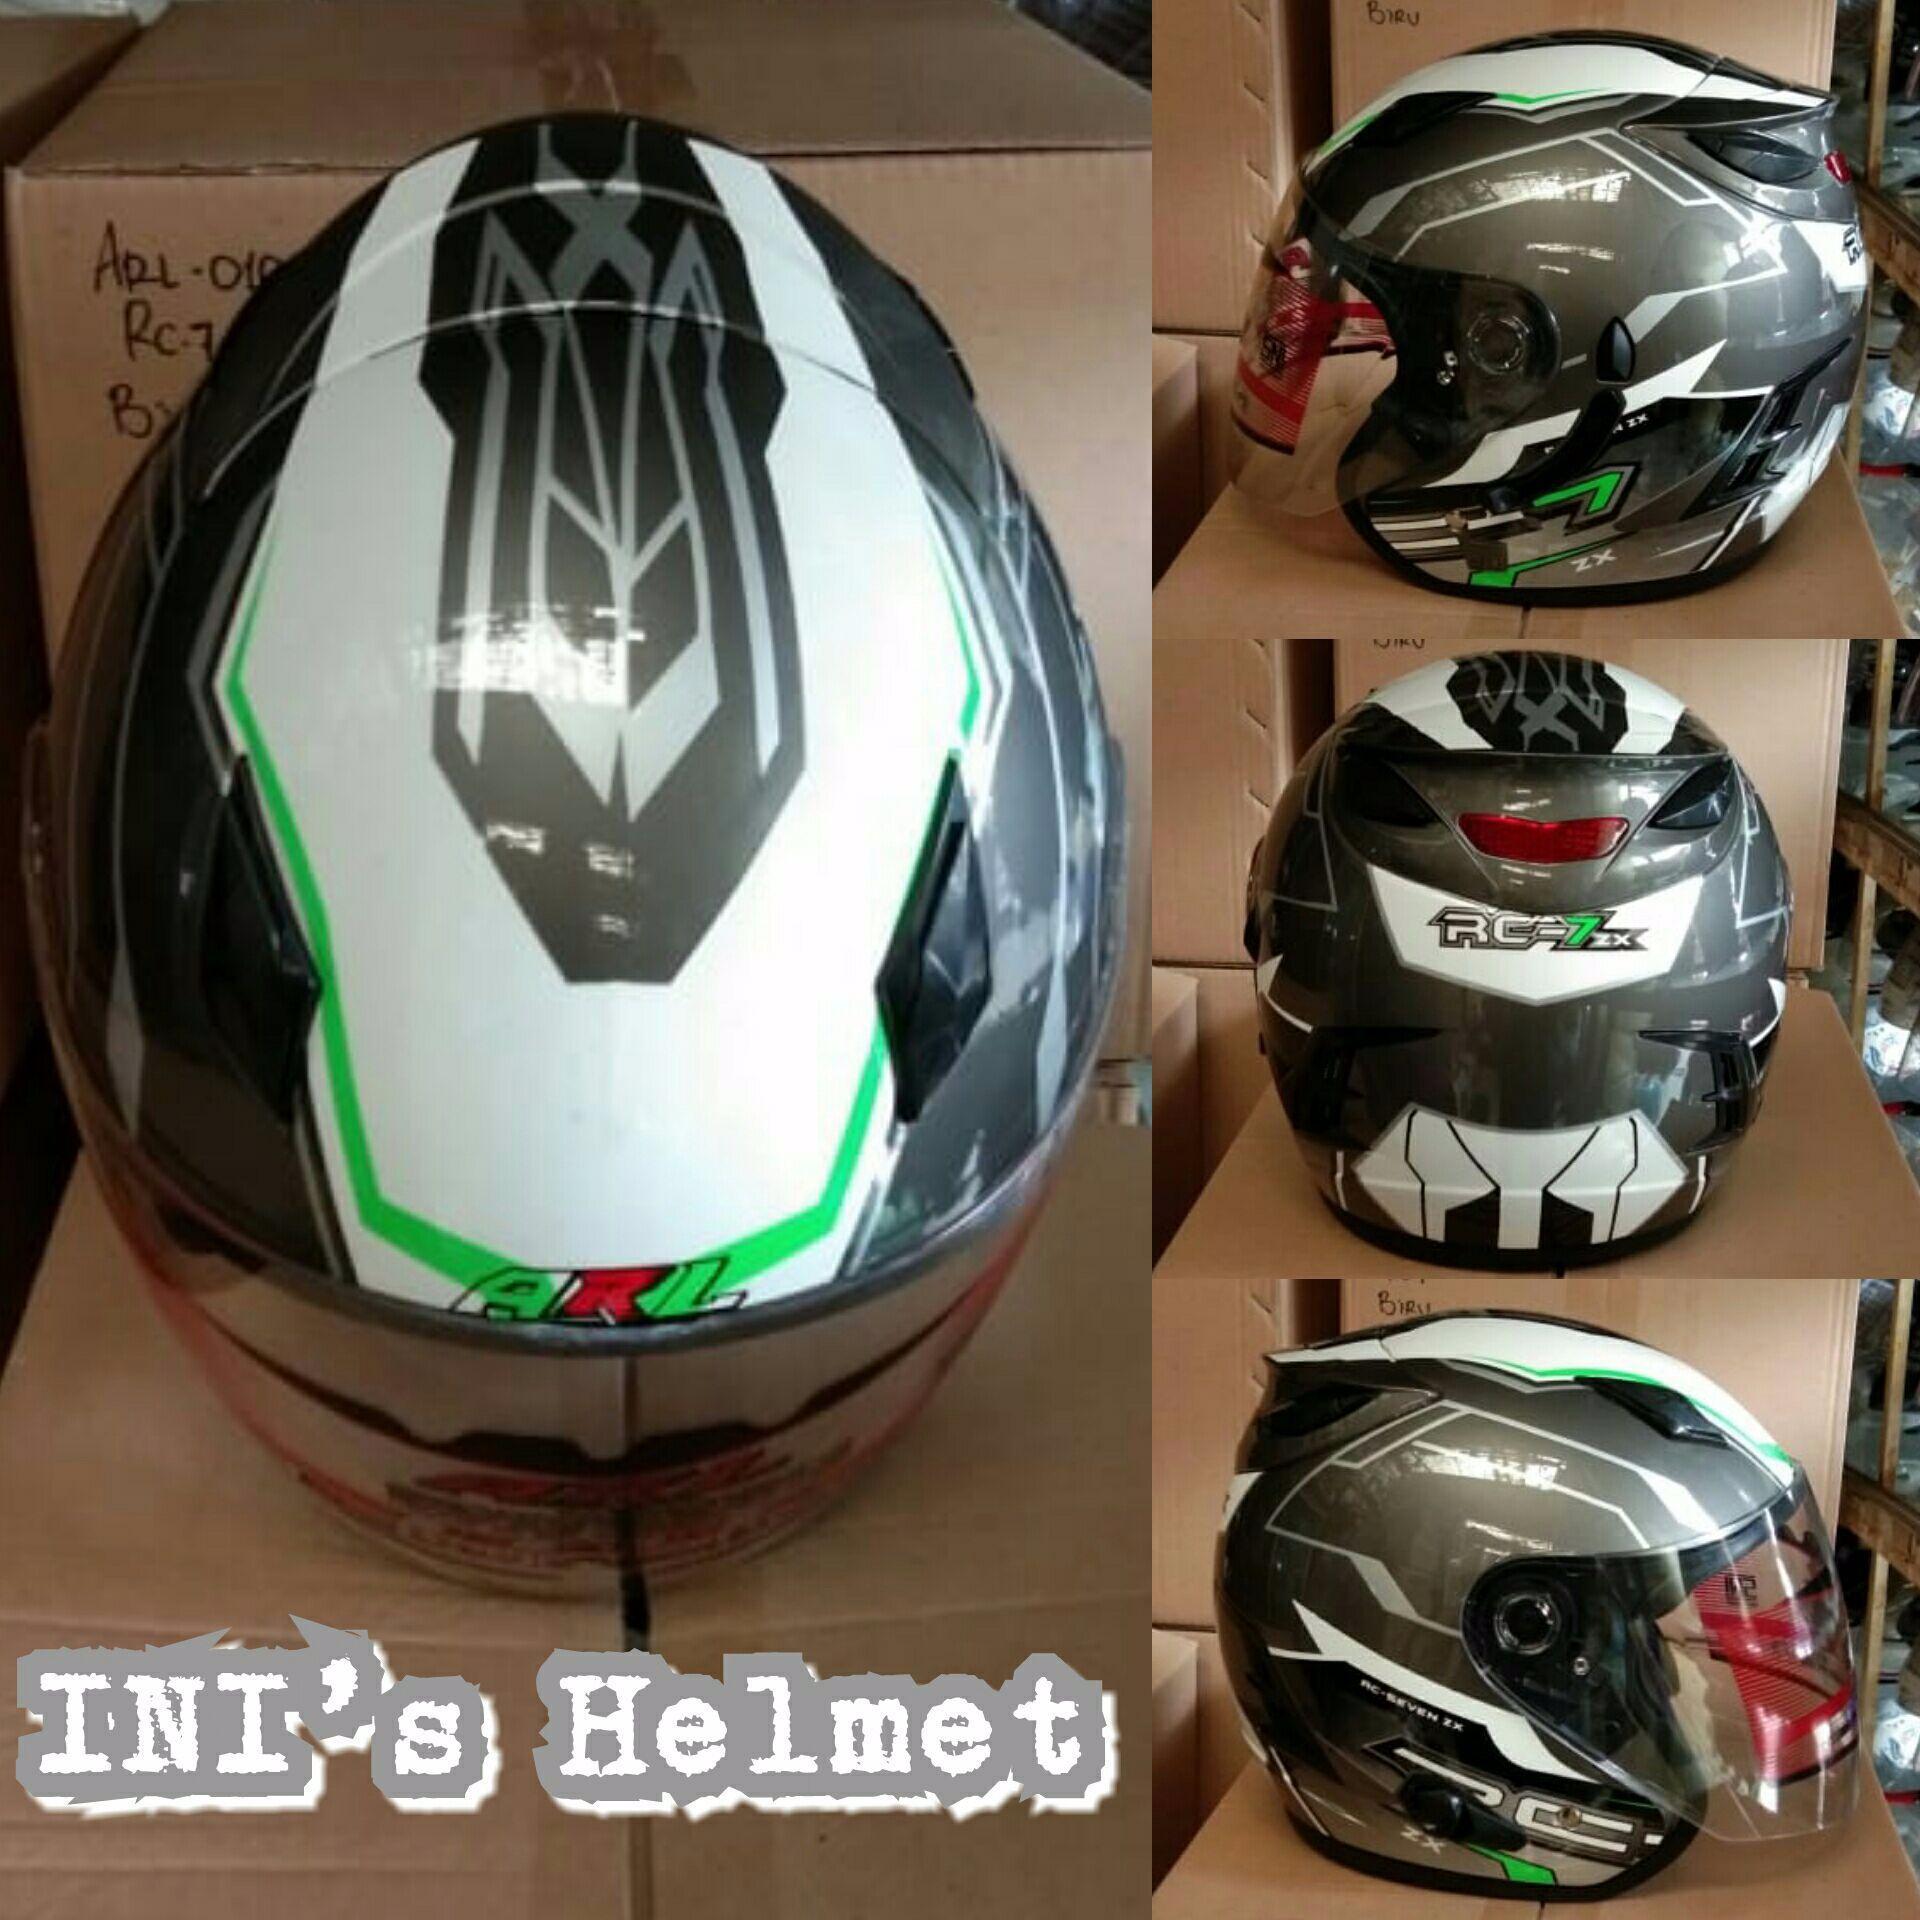 ( PROMO HELM + FREE ONGKIR ) Helm centro ARL Helmet motif double visor dan ada